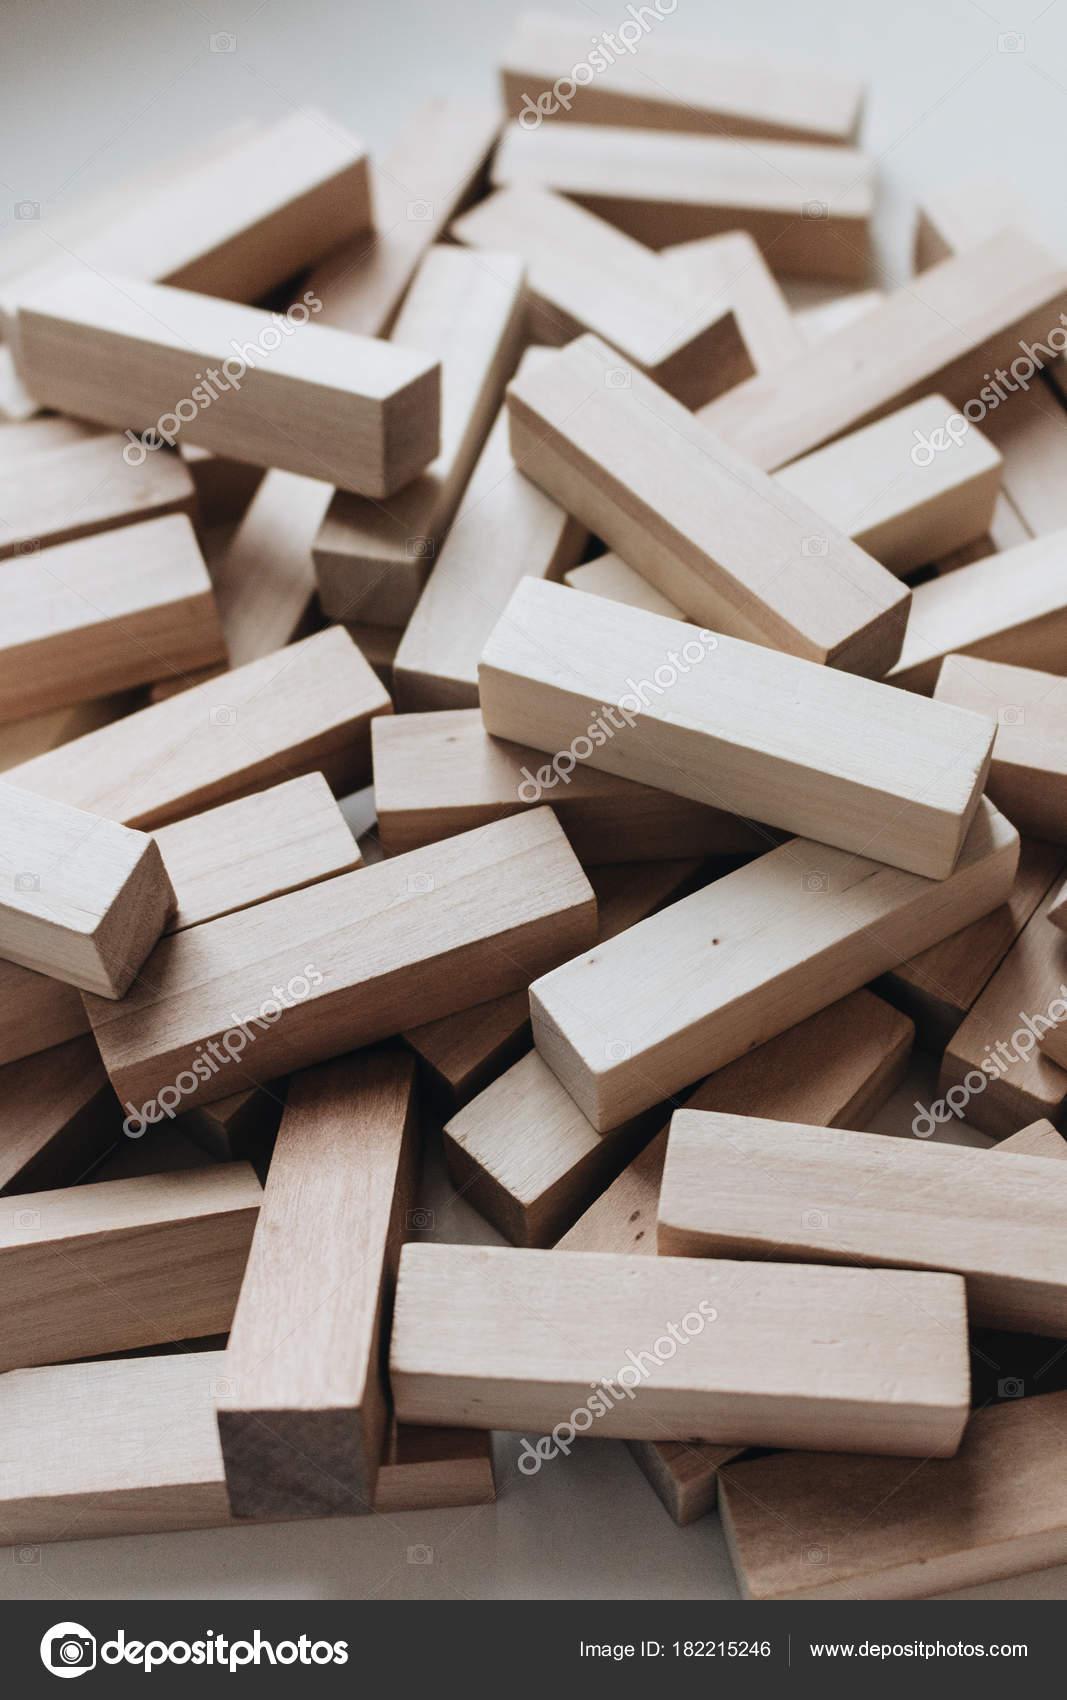 Monton Bloques Pequenos Madera Para Juego Mesa Jenga Foto De Stock